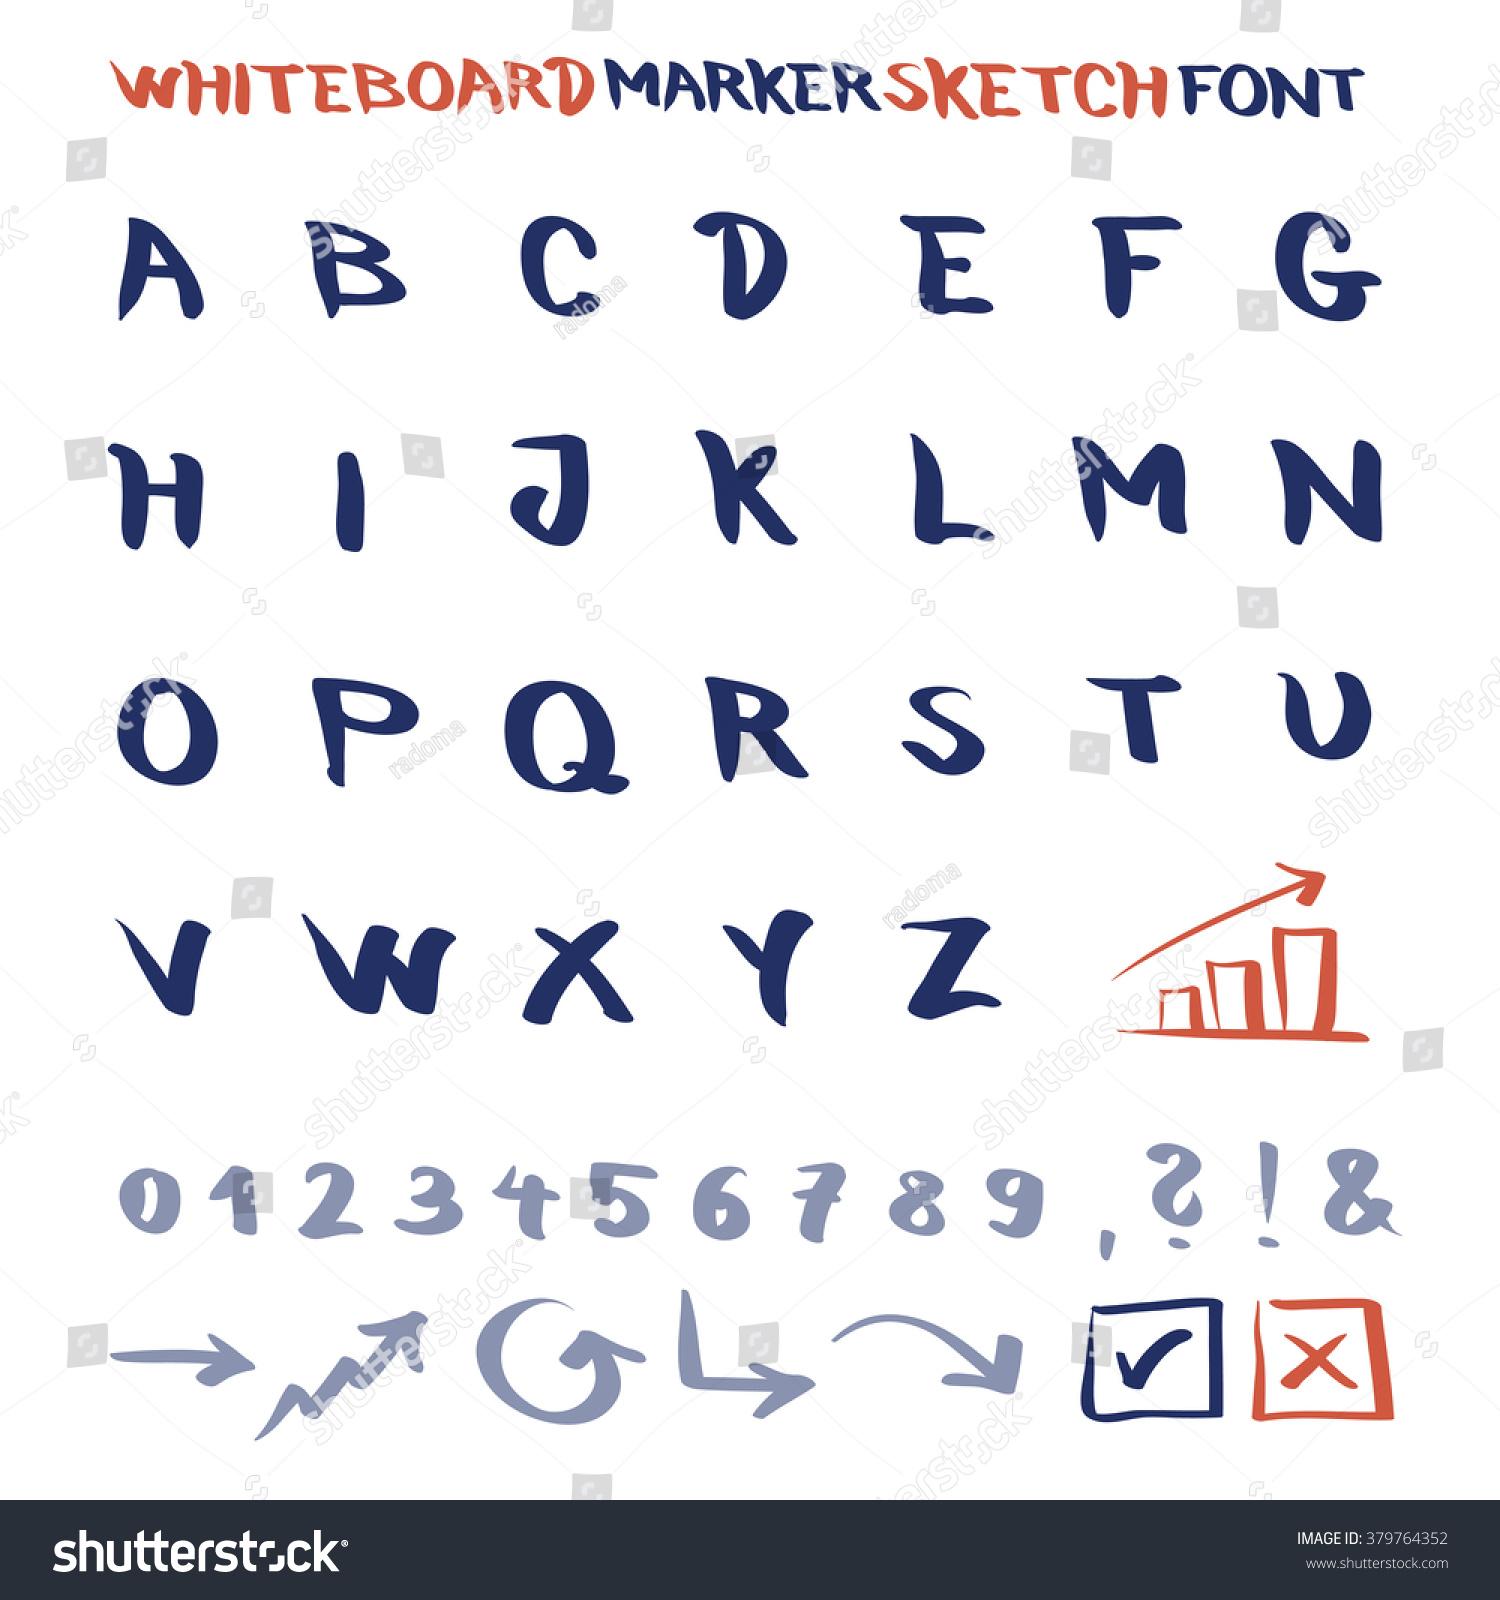 Whiteboard Marker Sketch Font Vector Alphabet Stock Vector Hd